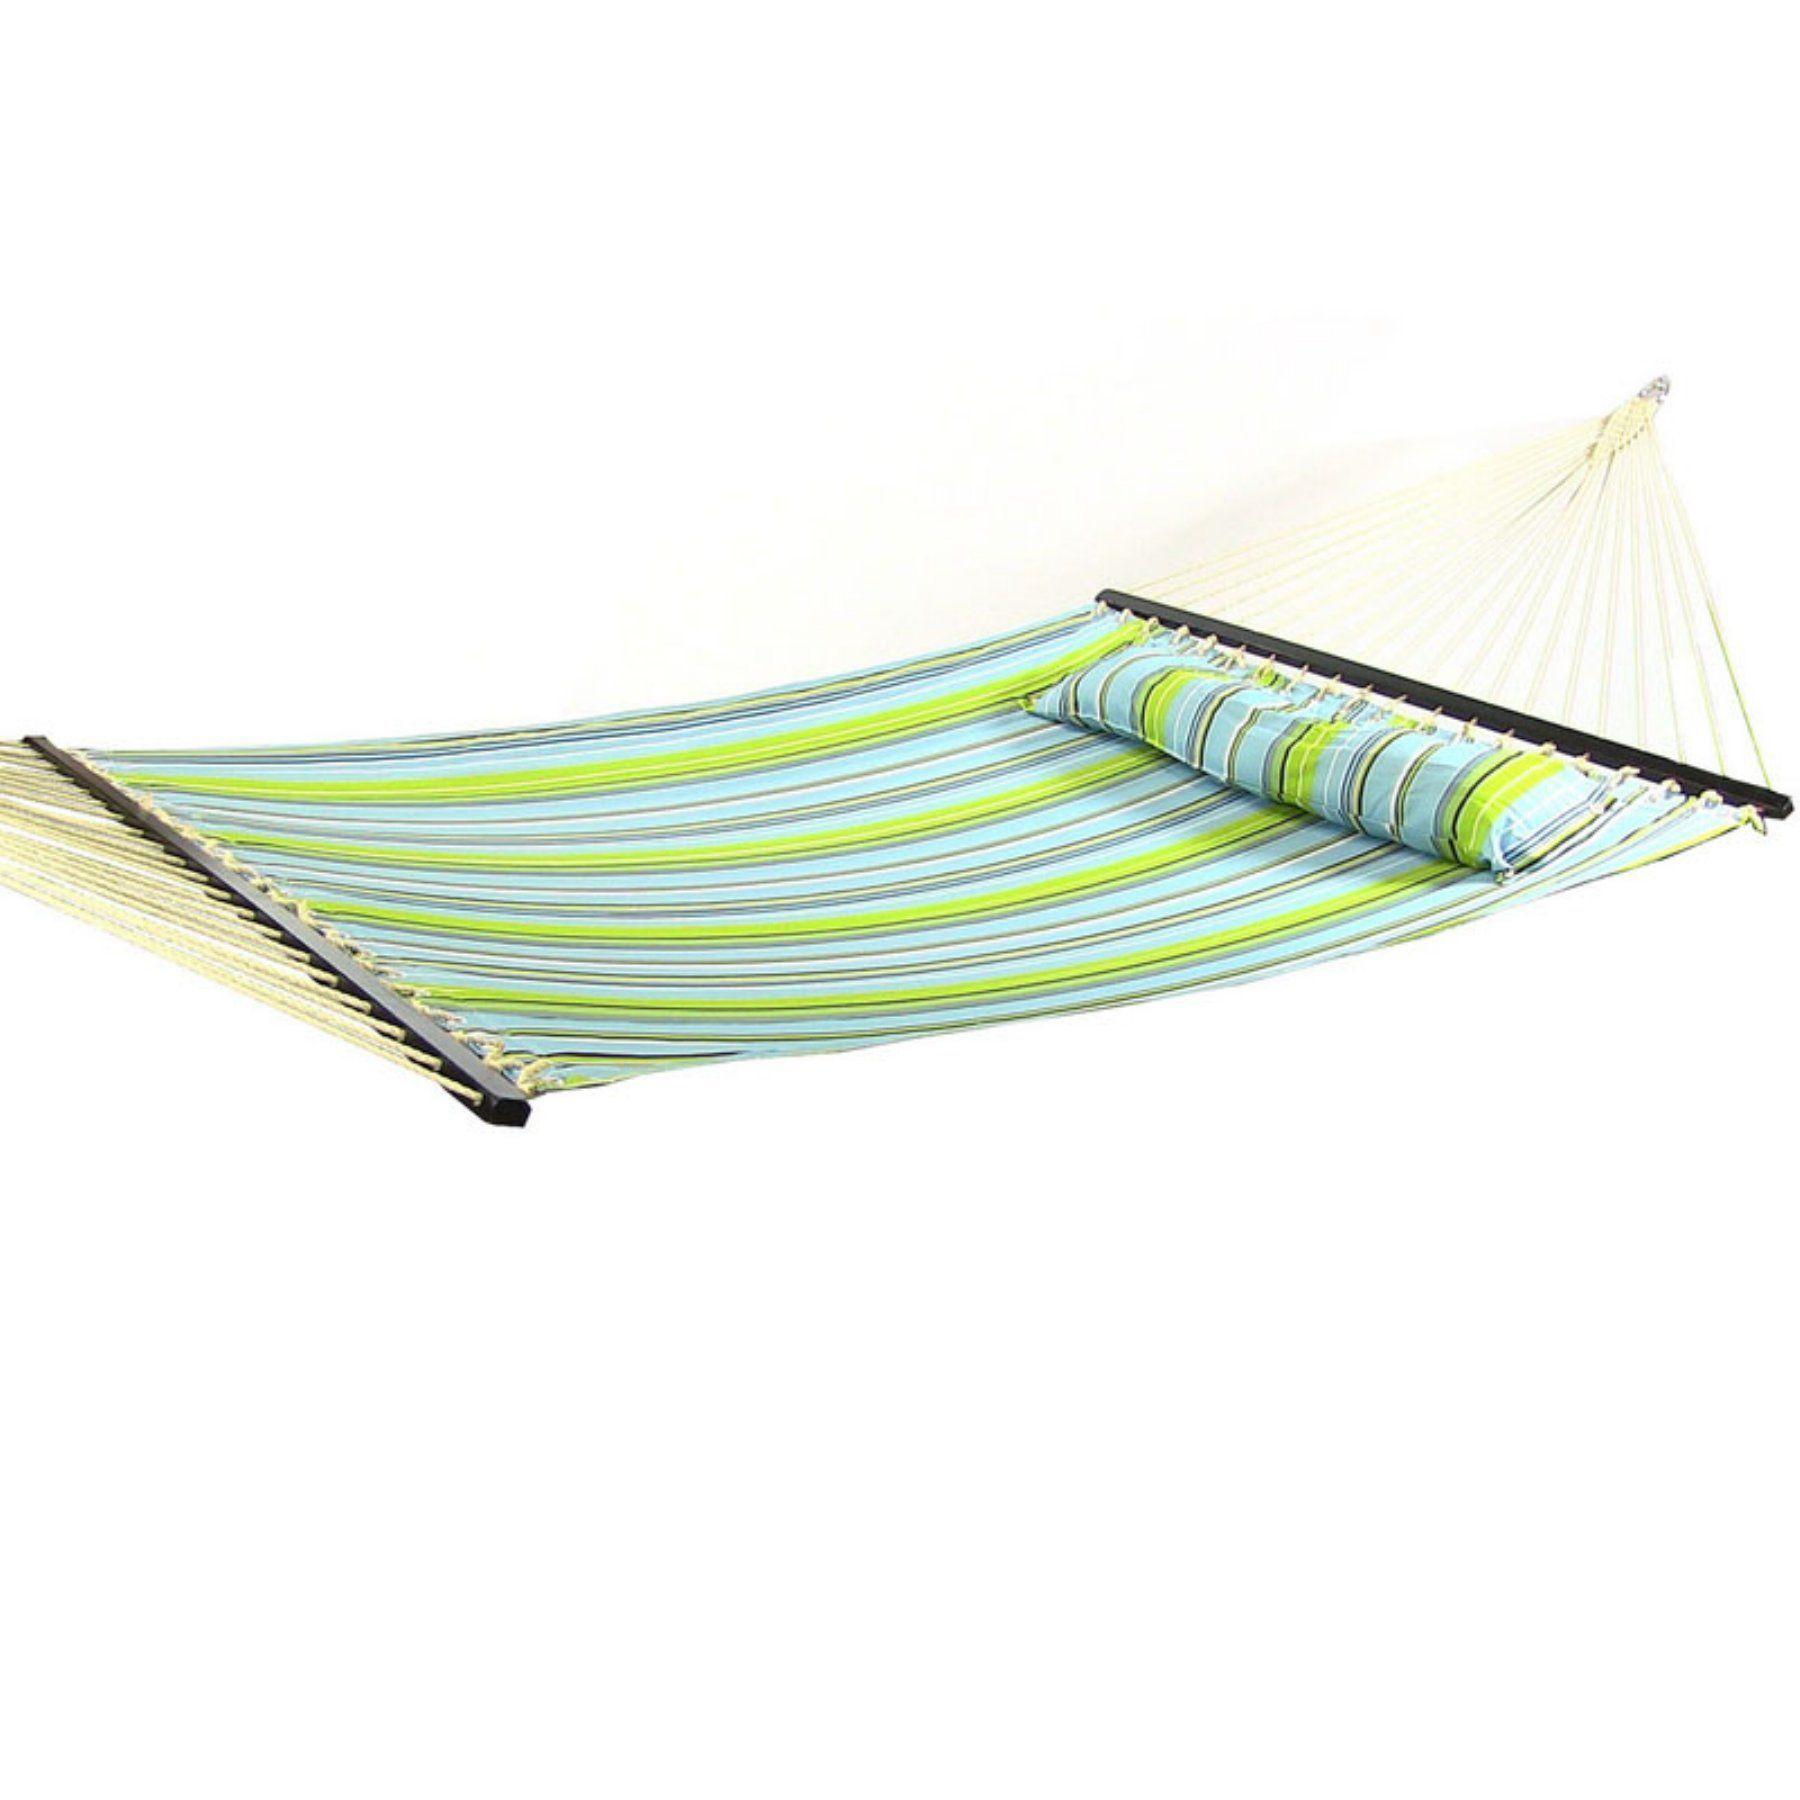 Sunnydaze decor ft sunnydaze quilted double hammock with